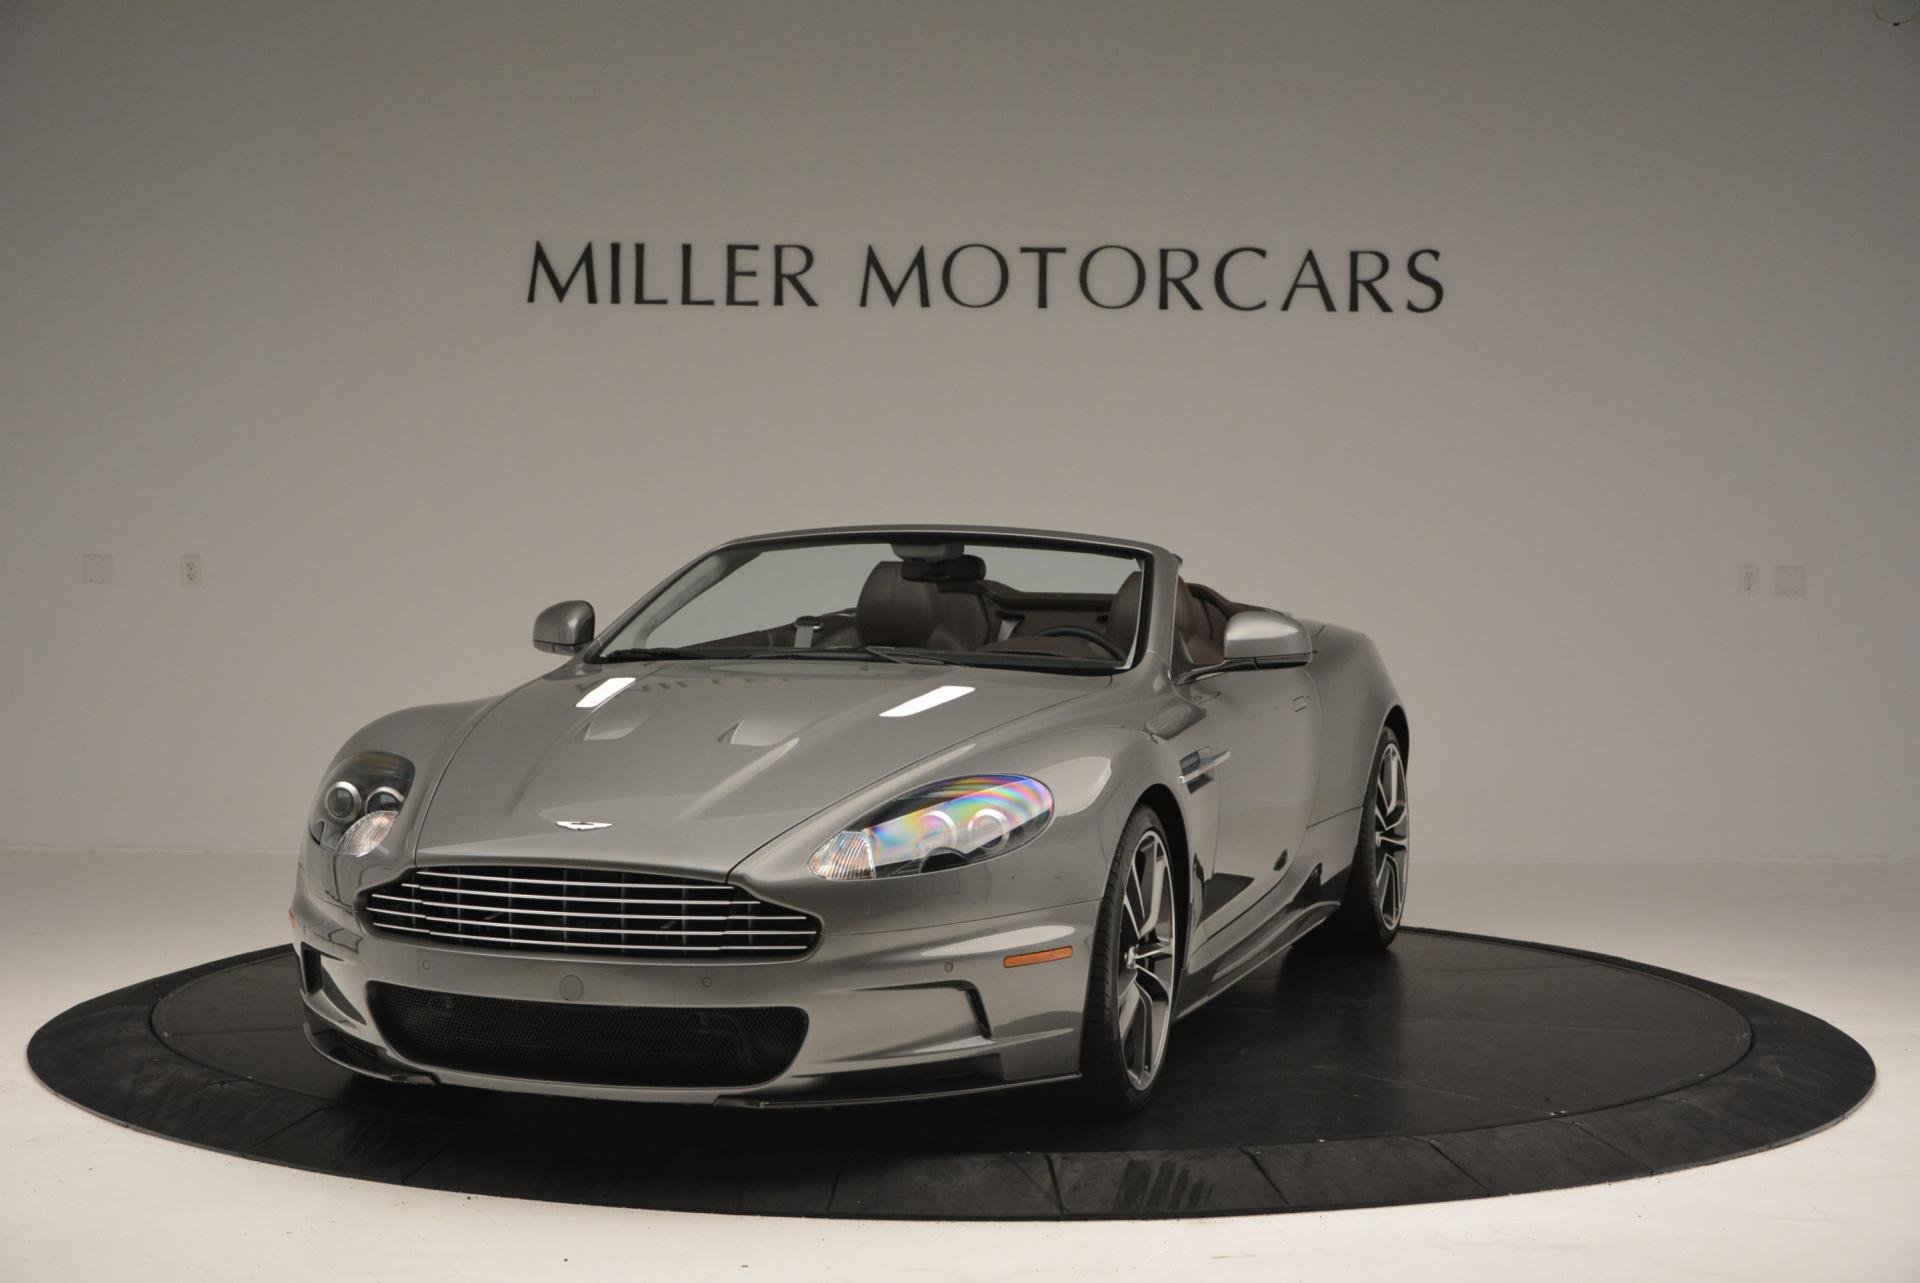 Used 2010 Aston Martin DBS Volante For Sale In Greenwich, CT 87_main